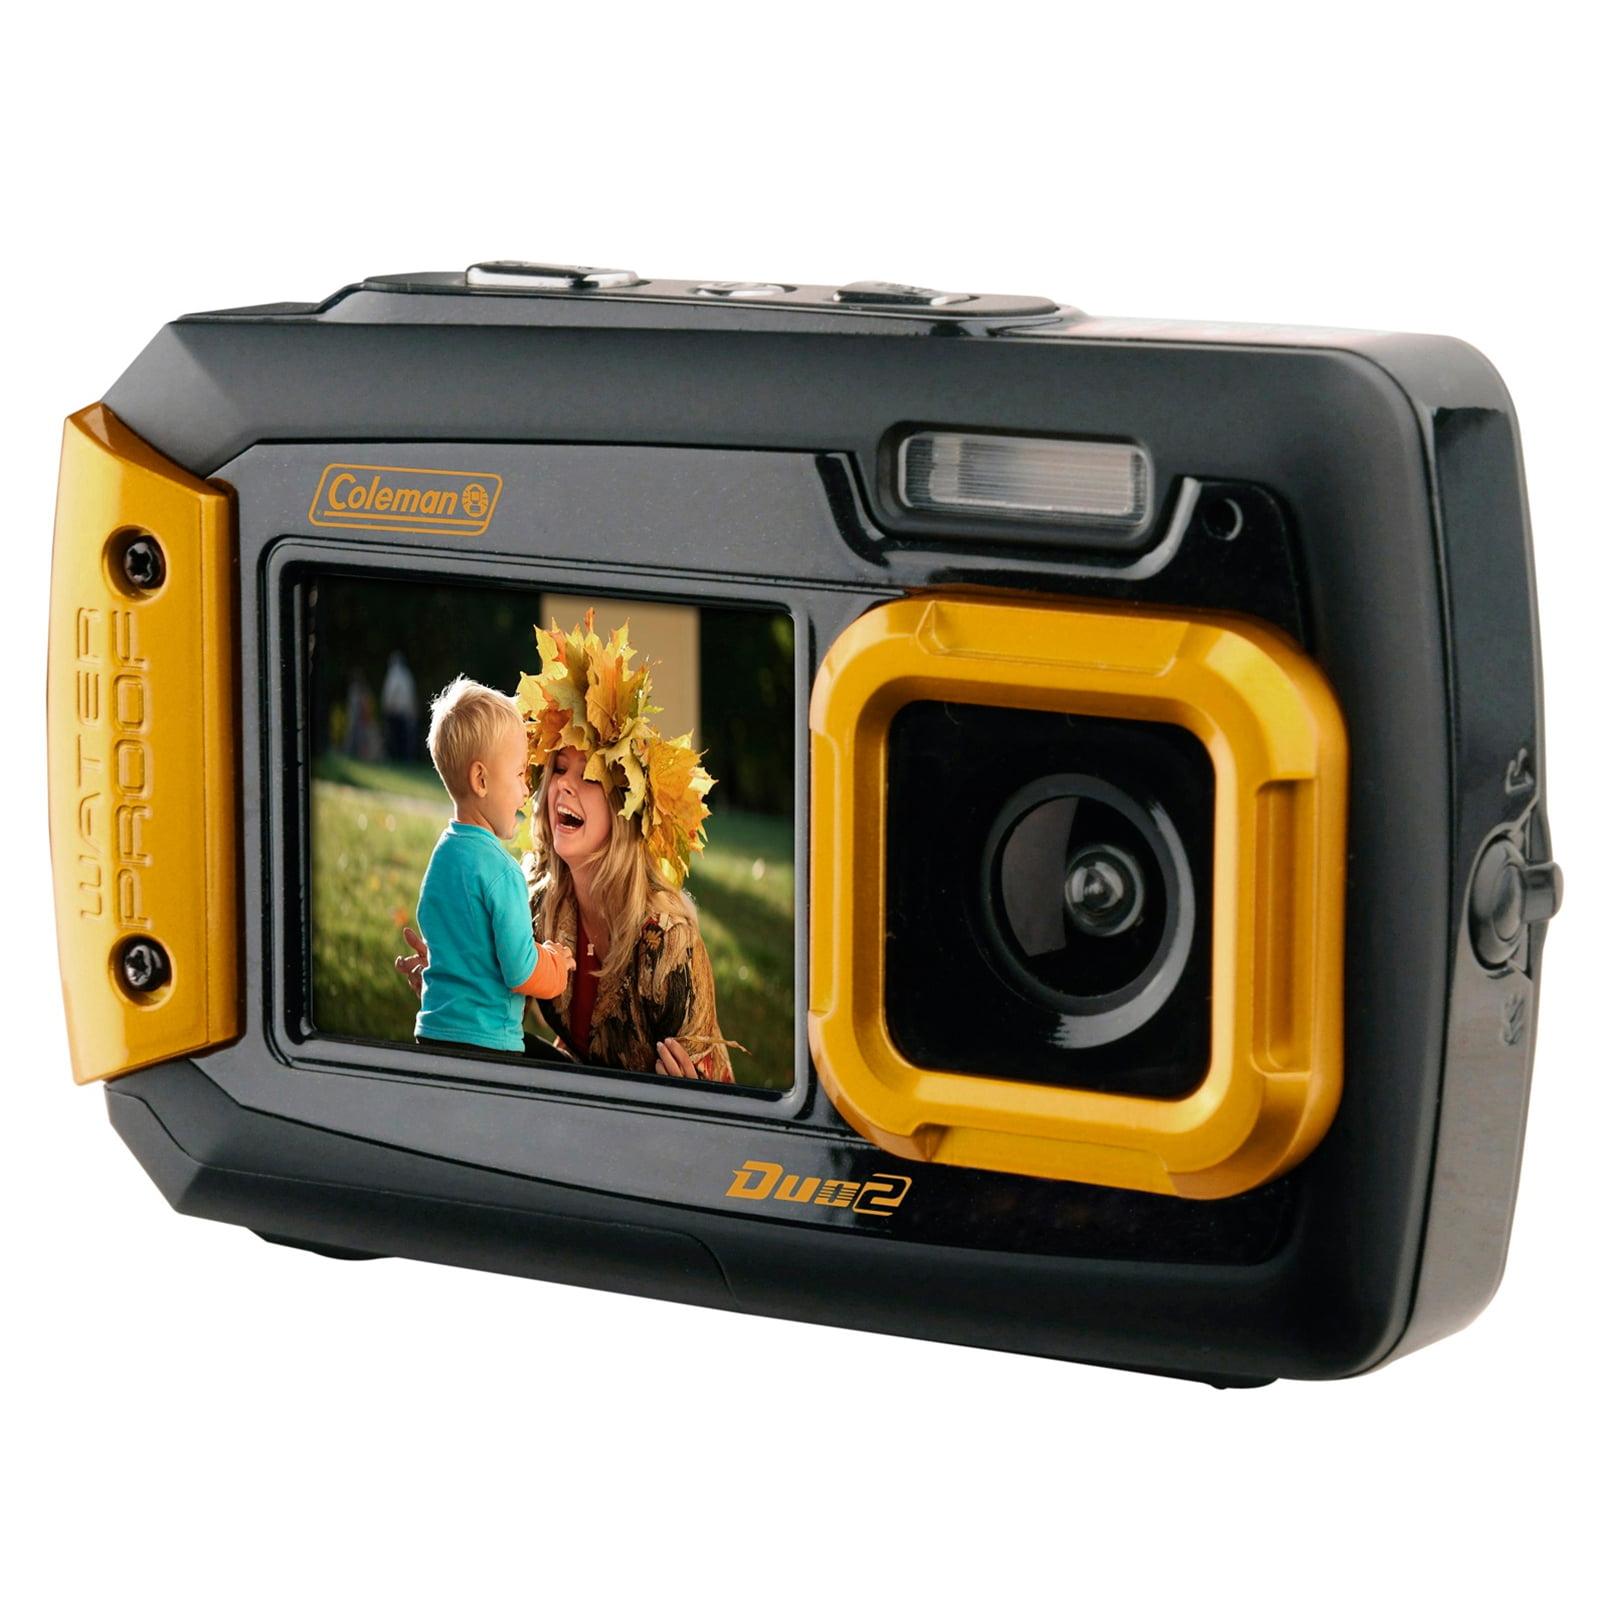 Coleman Duo2 20 MP Waterproof Digital Camera with Dual LCD Screen-Orange